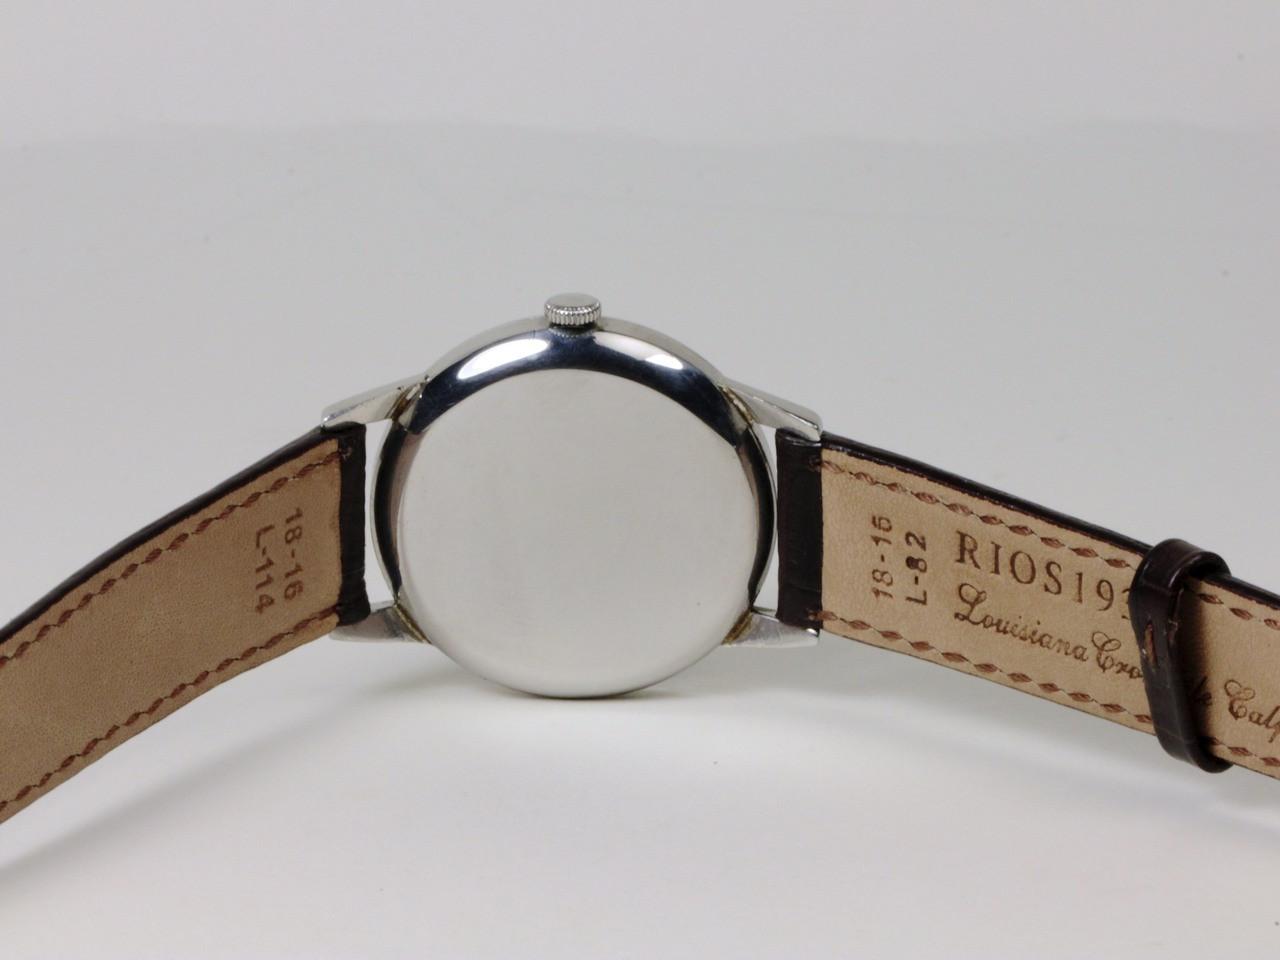 Case Back - Vintage IWC watch - Vintage Black Dial  - www.Legendoftime.com - Chicago Watch Center